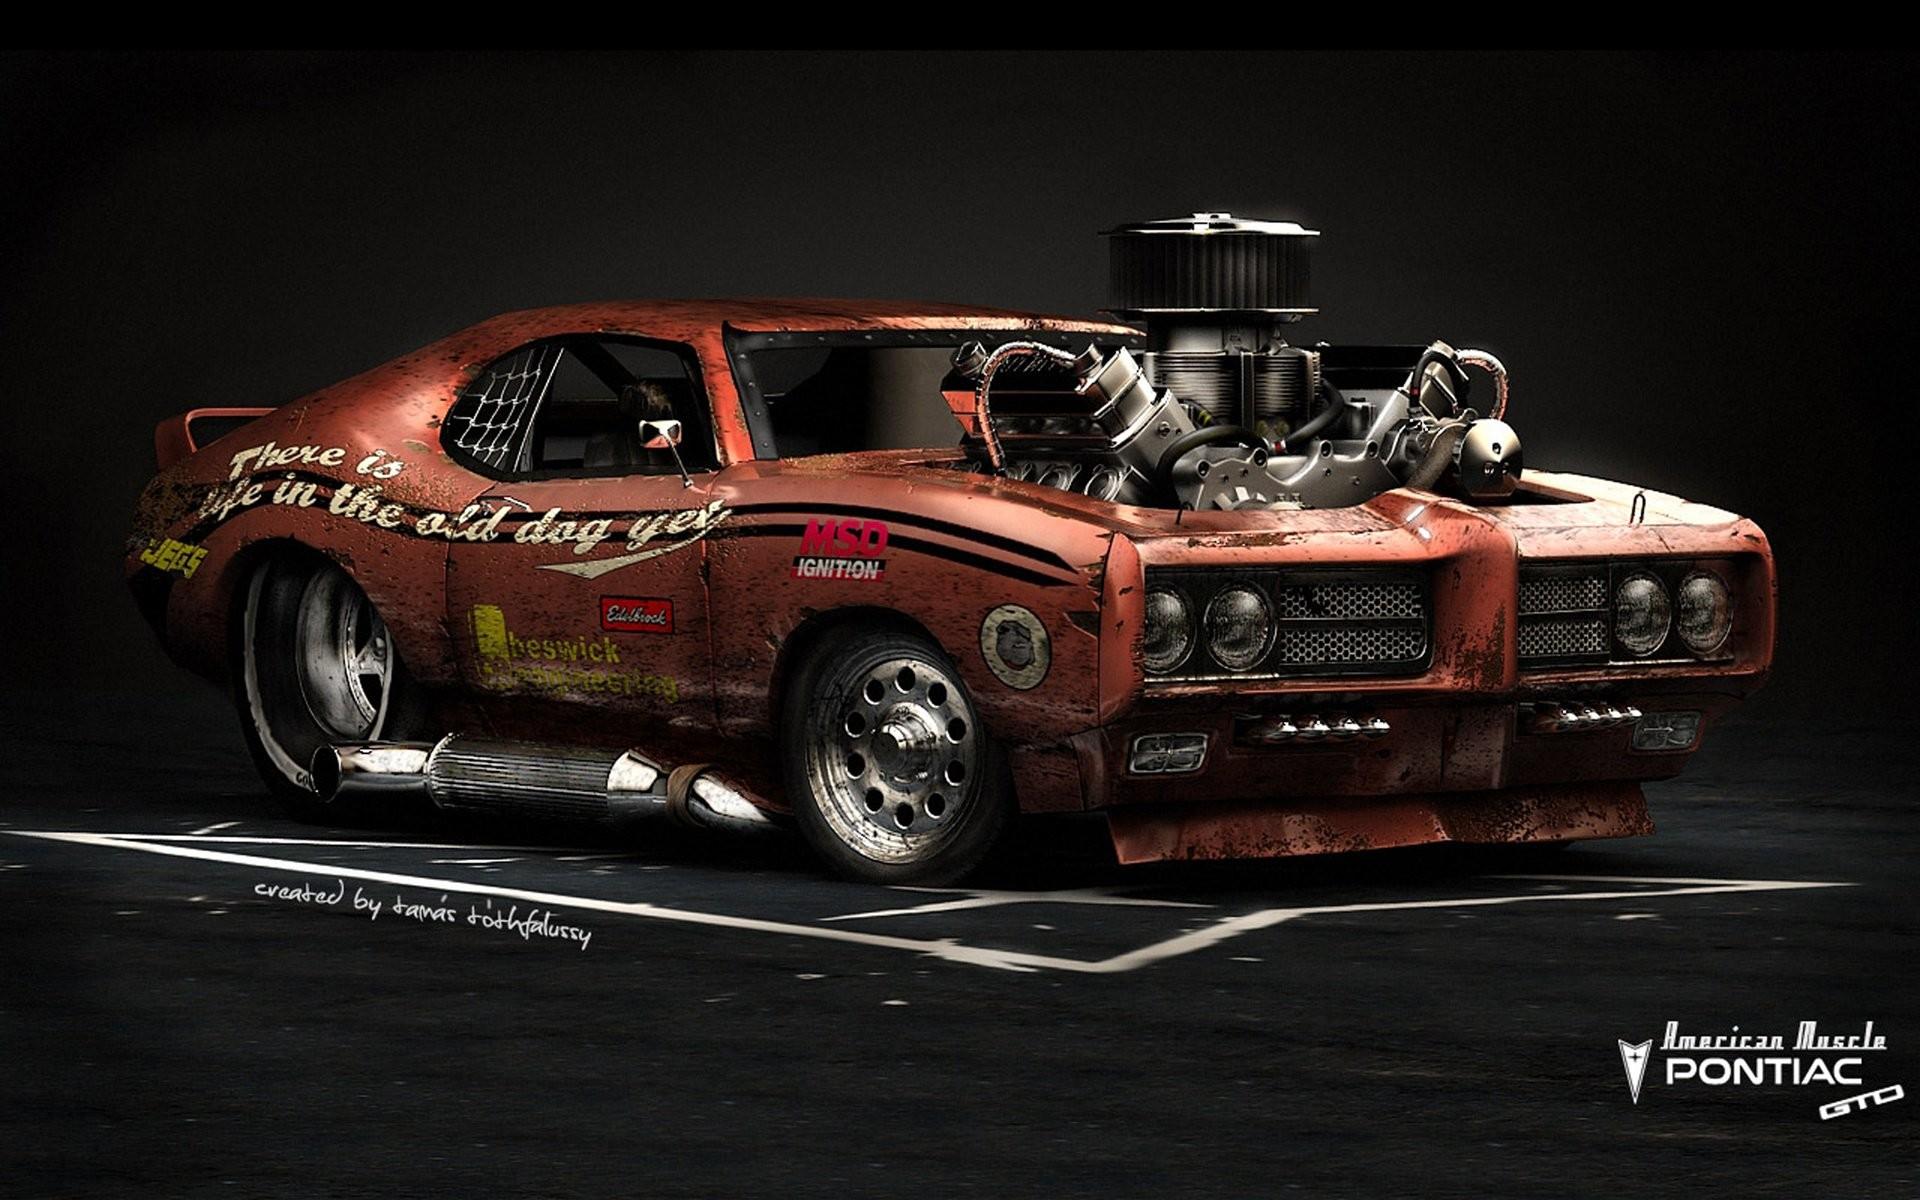 67 Muscle Car Screensavers And Wallpaper